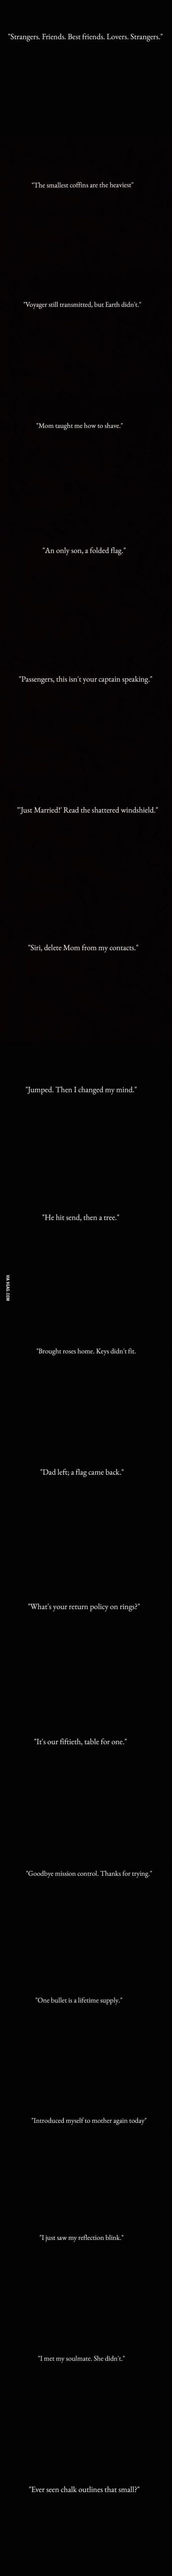 Heartbreaking-Six-Word-Stories